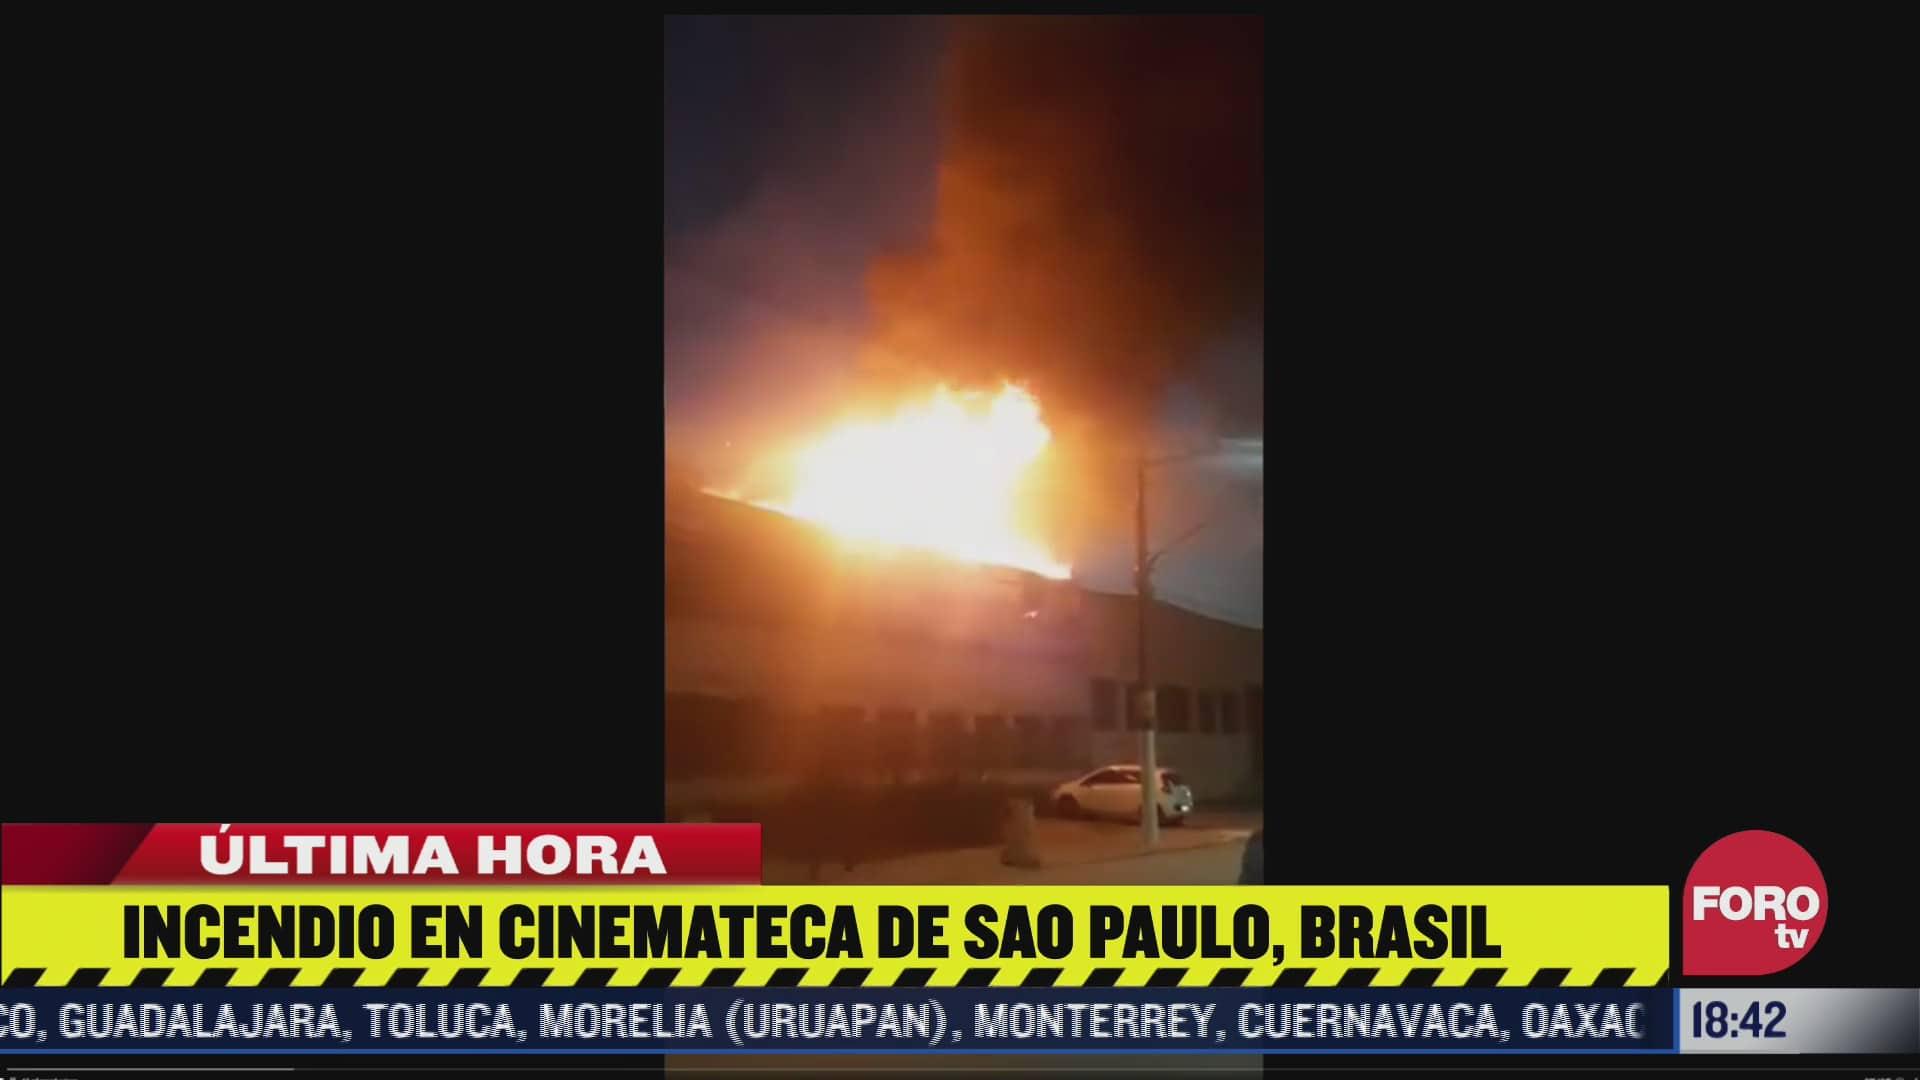 se registra incendio en la cinemateca de sao paulo brasil